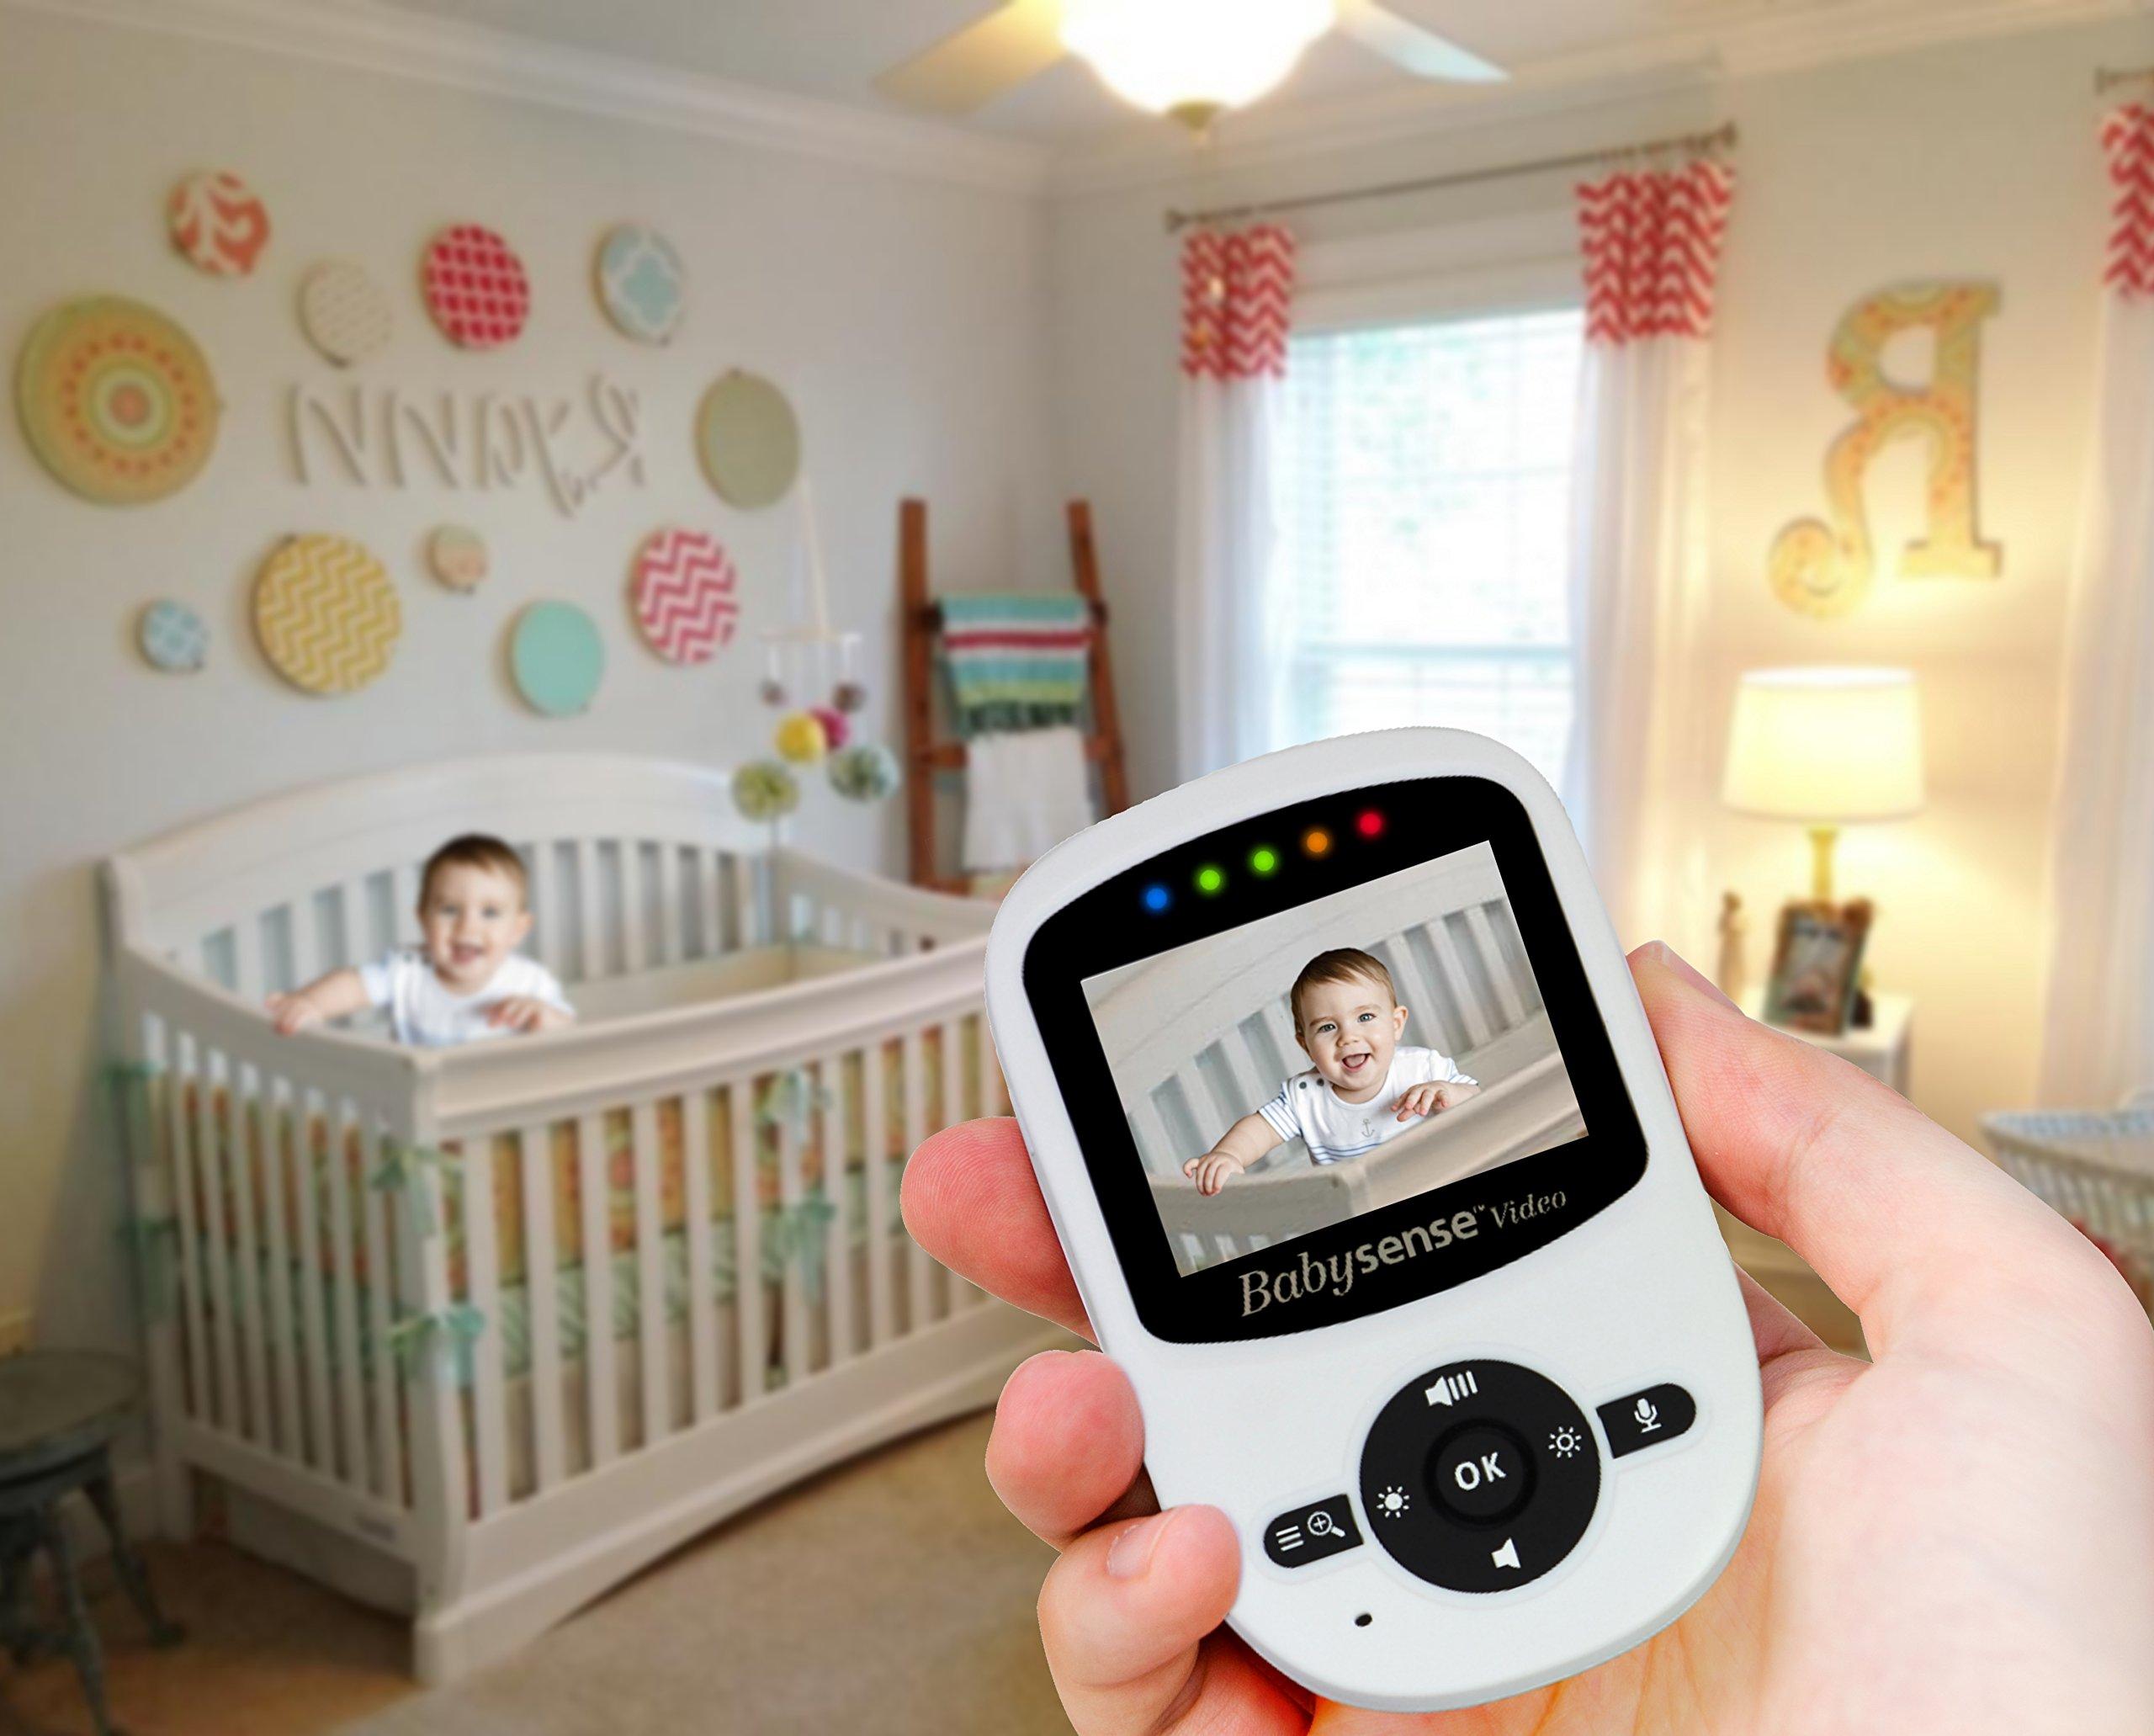 New Model: Babysense Video + Baby Movement Monitor - Bundle Pack: Babysense Video Baby Monitor with Babysense 7 Under-The-Mattress Baby Movement Monitor - 2 in 1 by Babysense (Image #4)